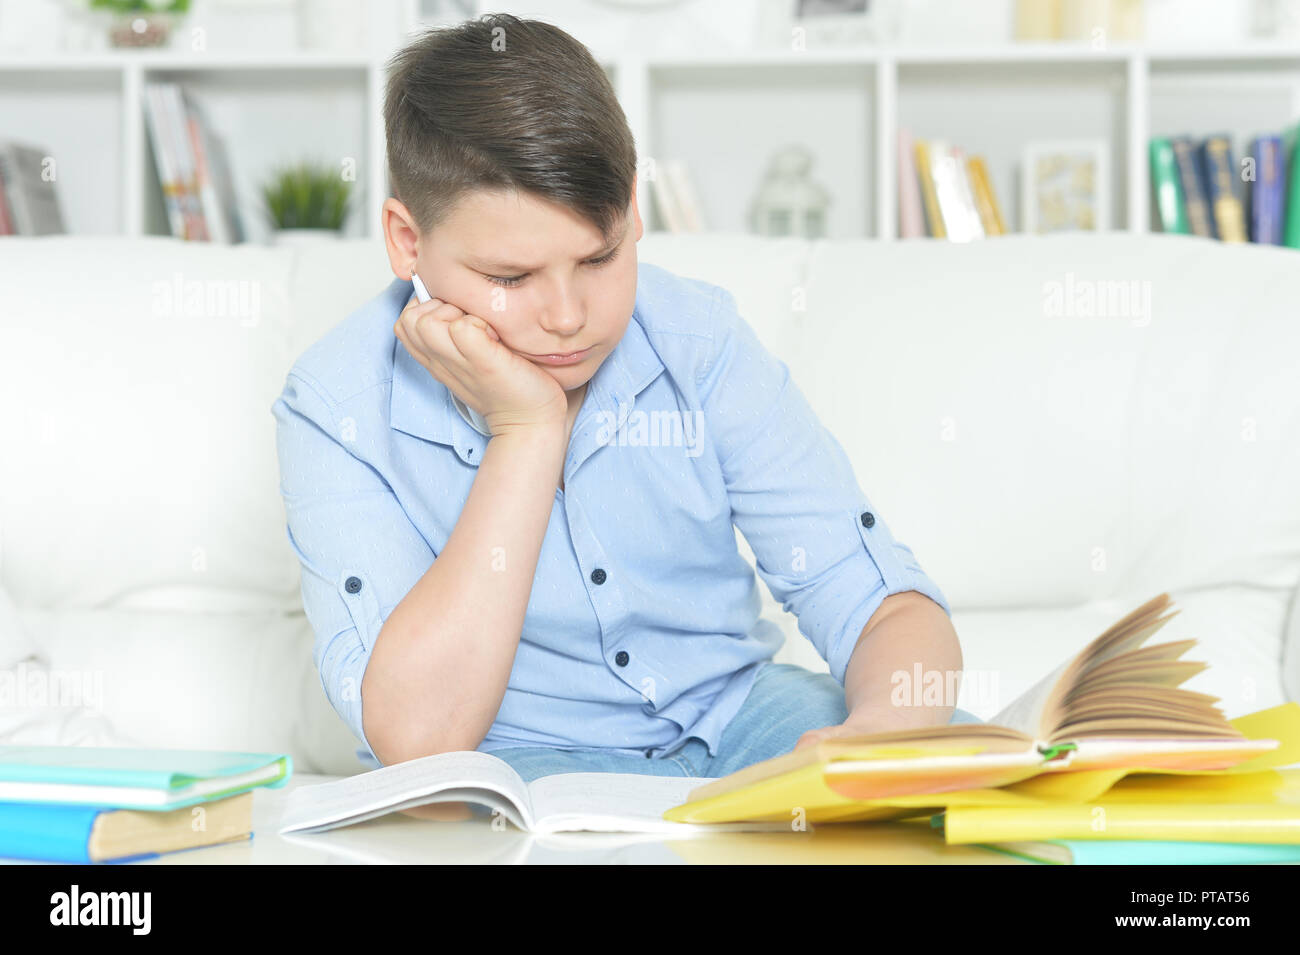 portrait of a boy doing homework at home stock photo 221514642 alamy rh alamy com Homework Help at Home Family Doing Homework